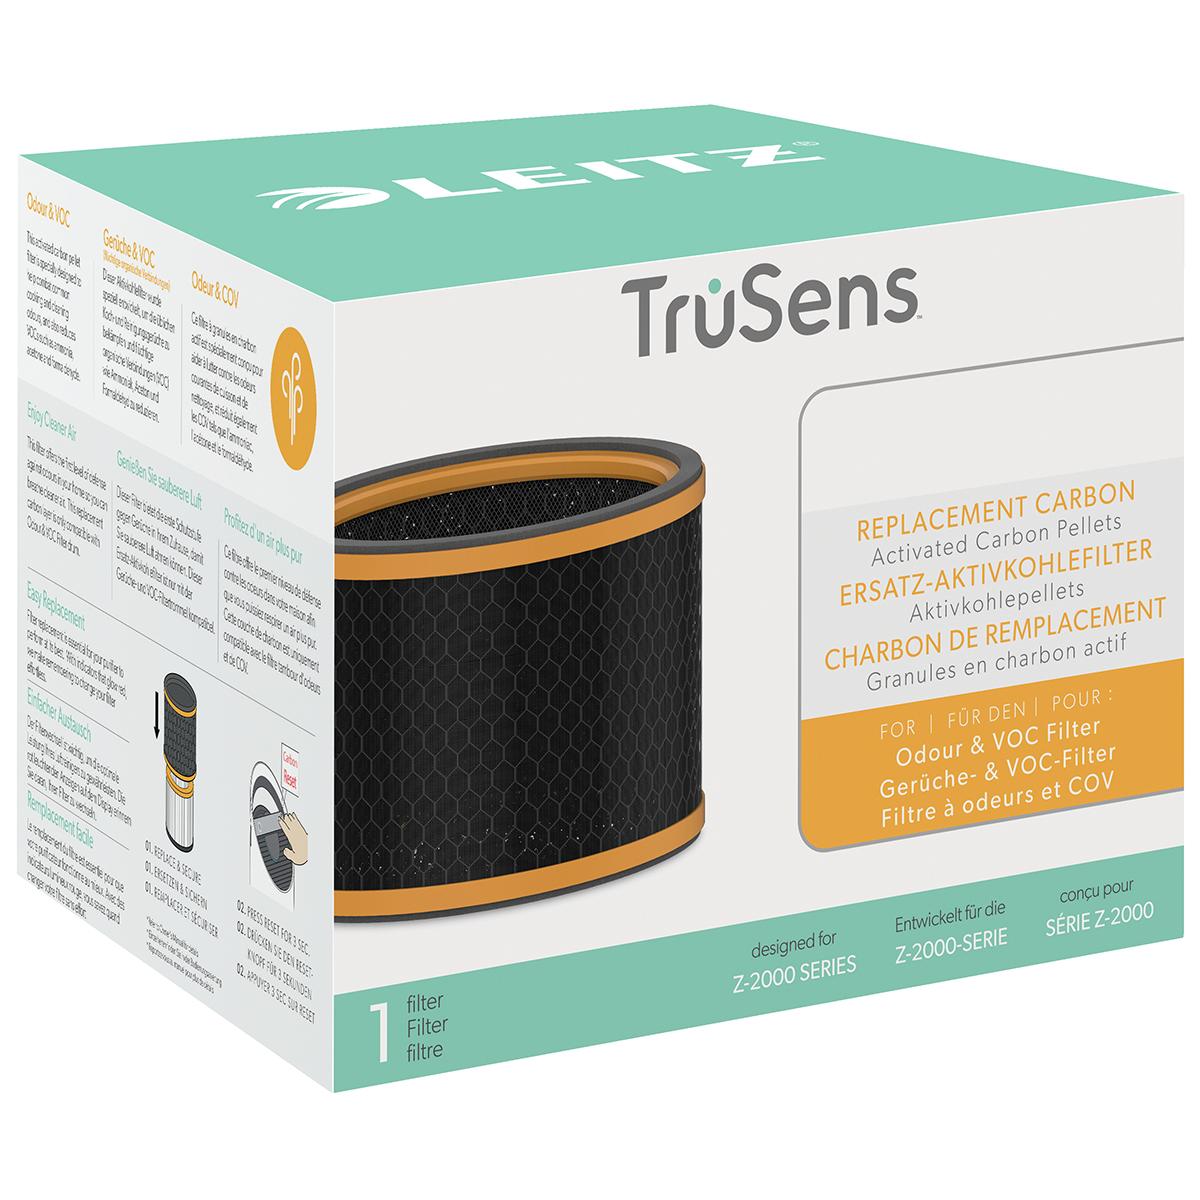 Leitz TruSens Z-2000 Odour and VOC 3-in-1 Carbon Filter